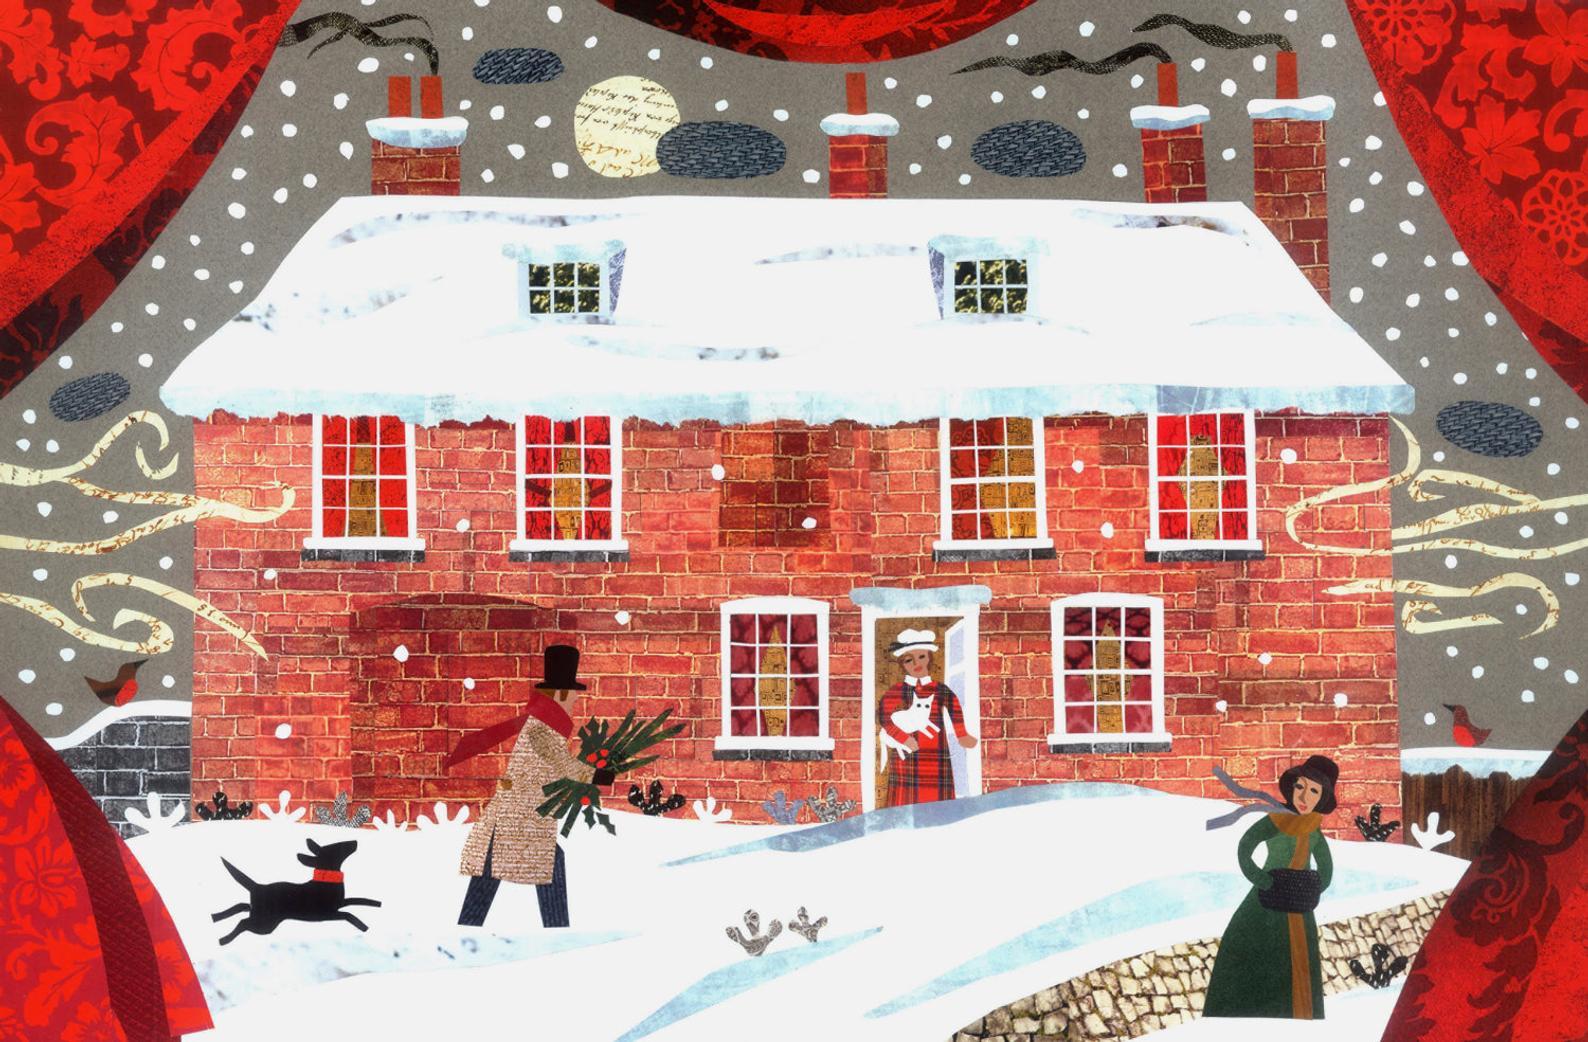 Jane Austen Christmas at Chawton